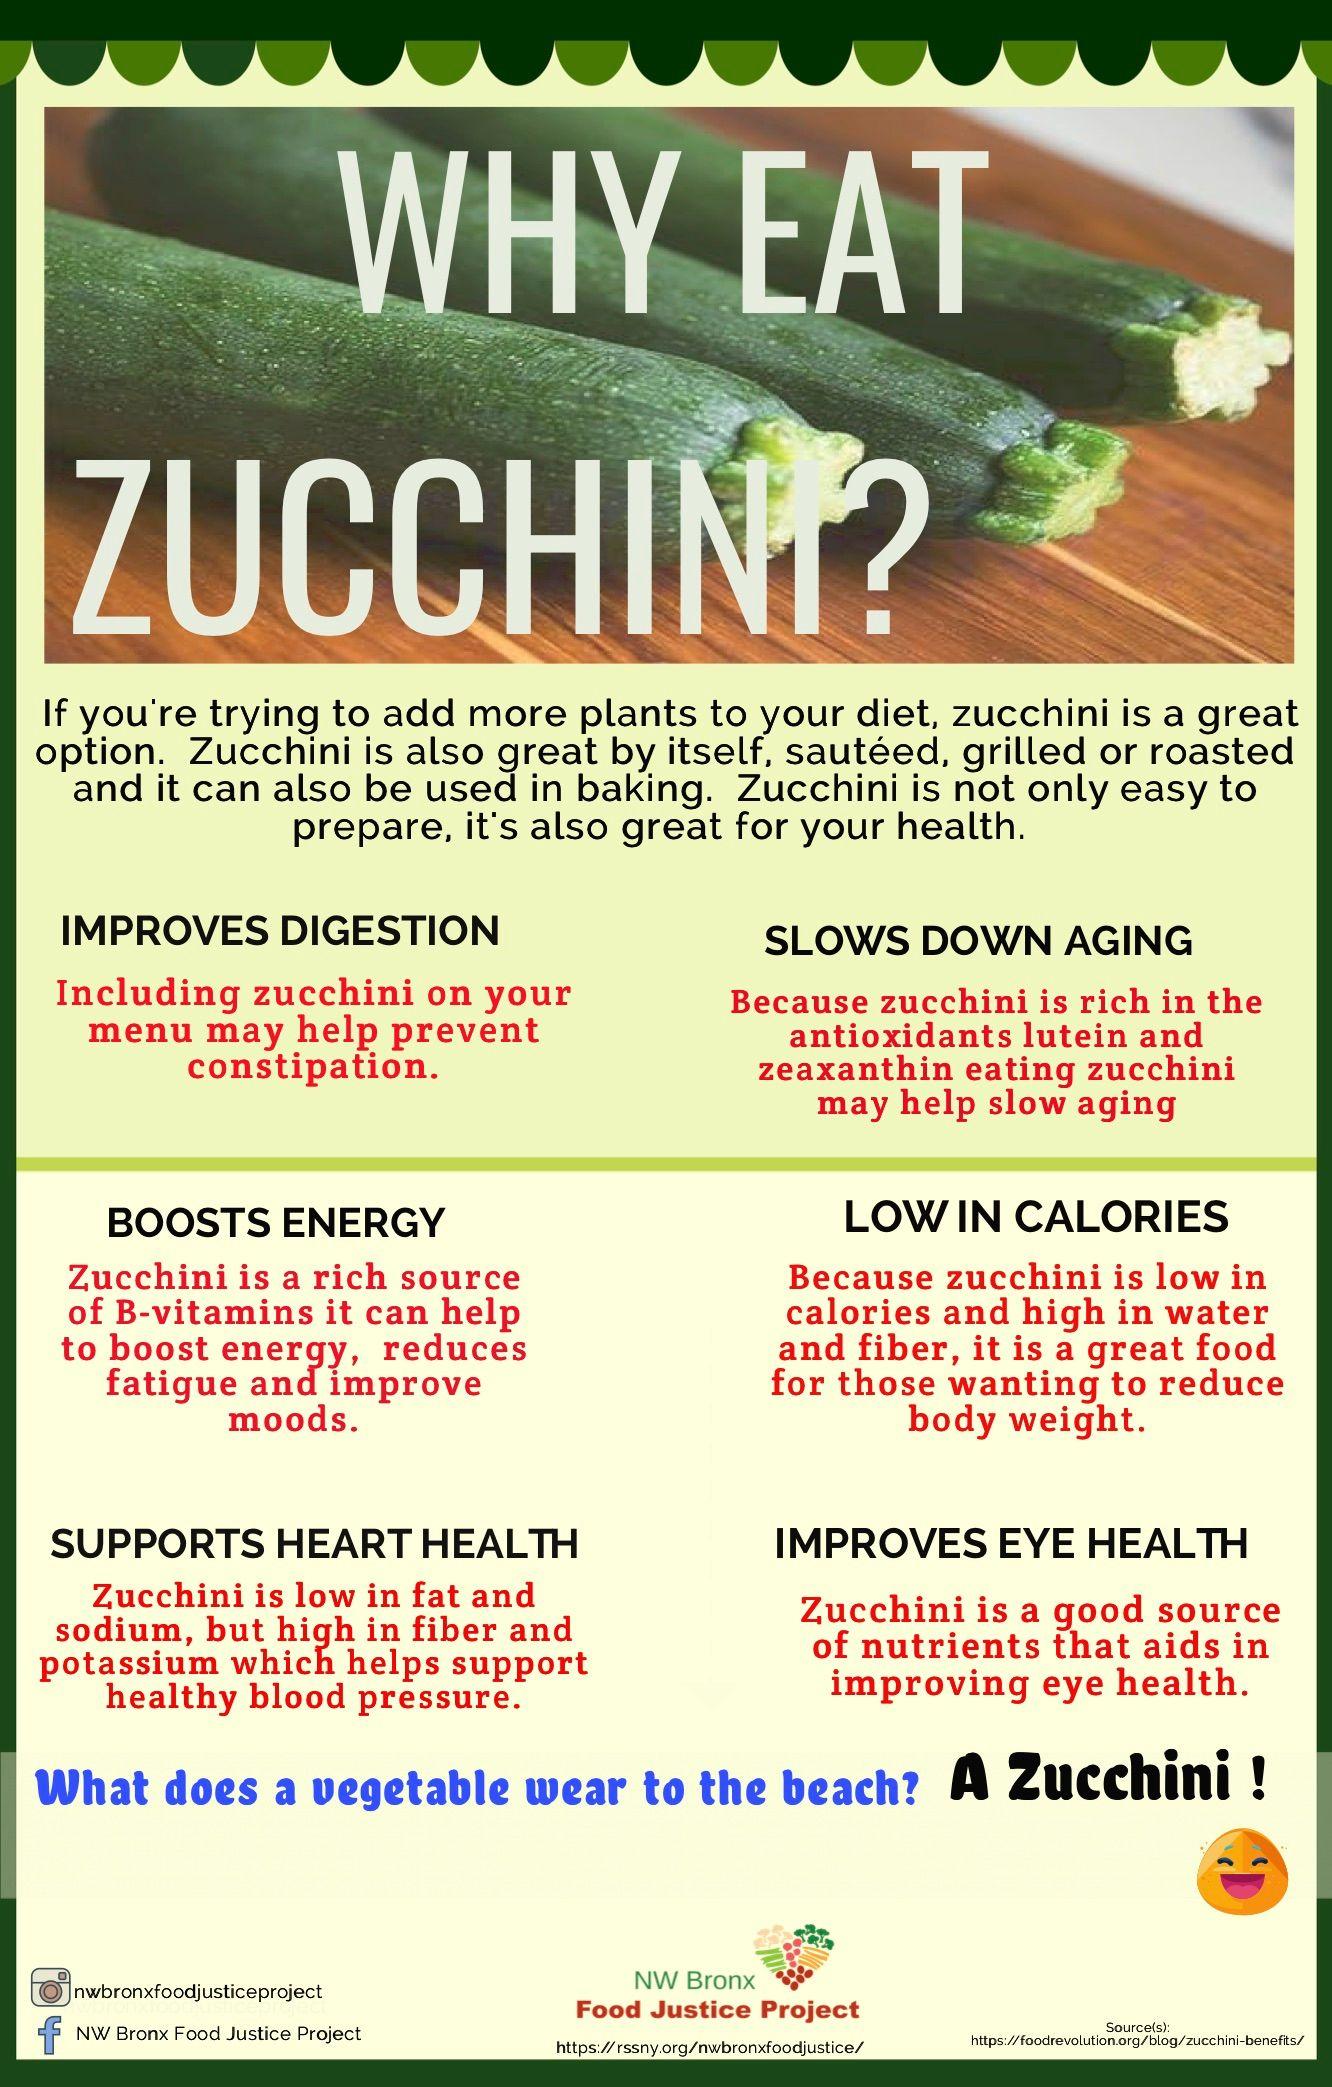 Why Eat Zucchini?